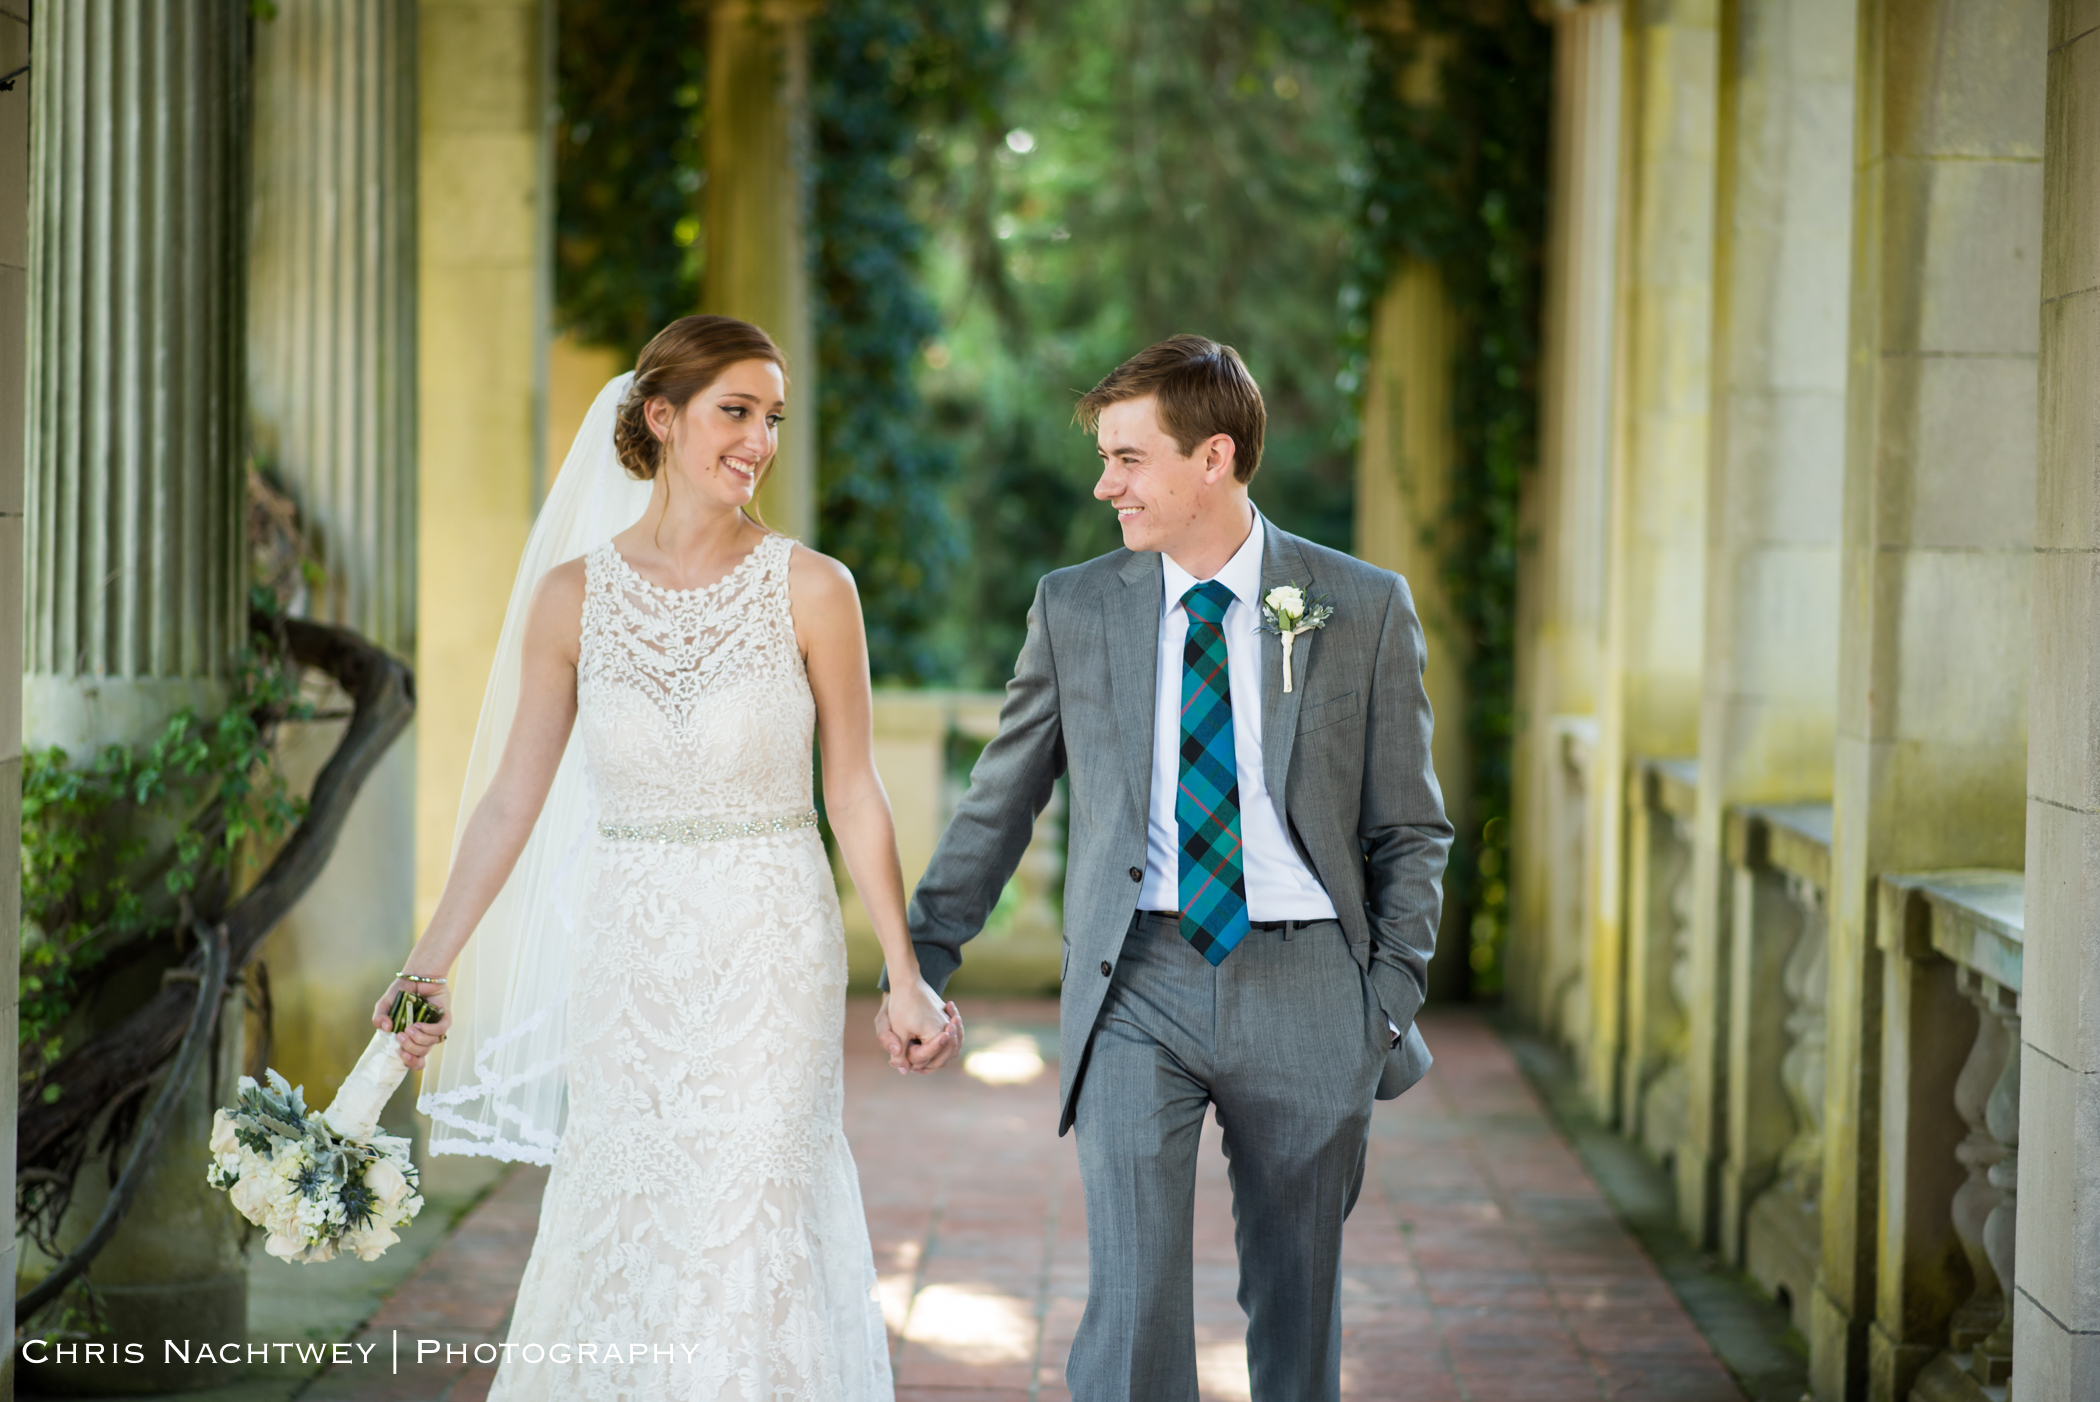 harkness-wedding-photos-chris-nachtwey-photography-2018-23.jpg